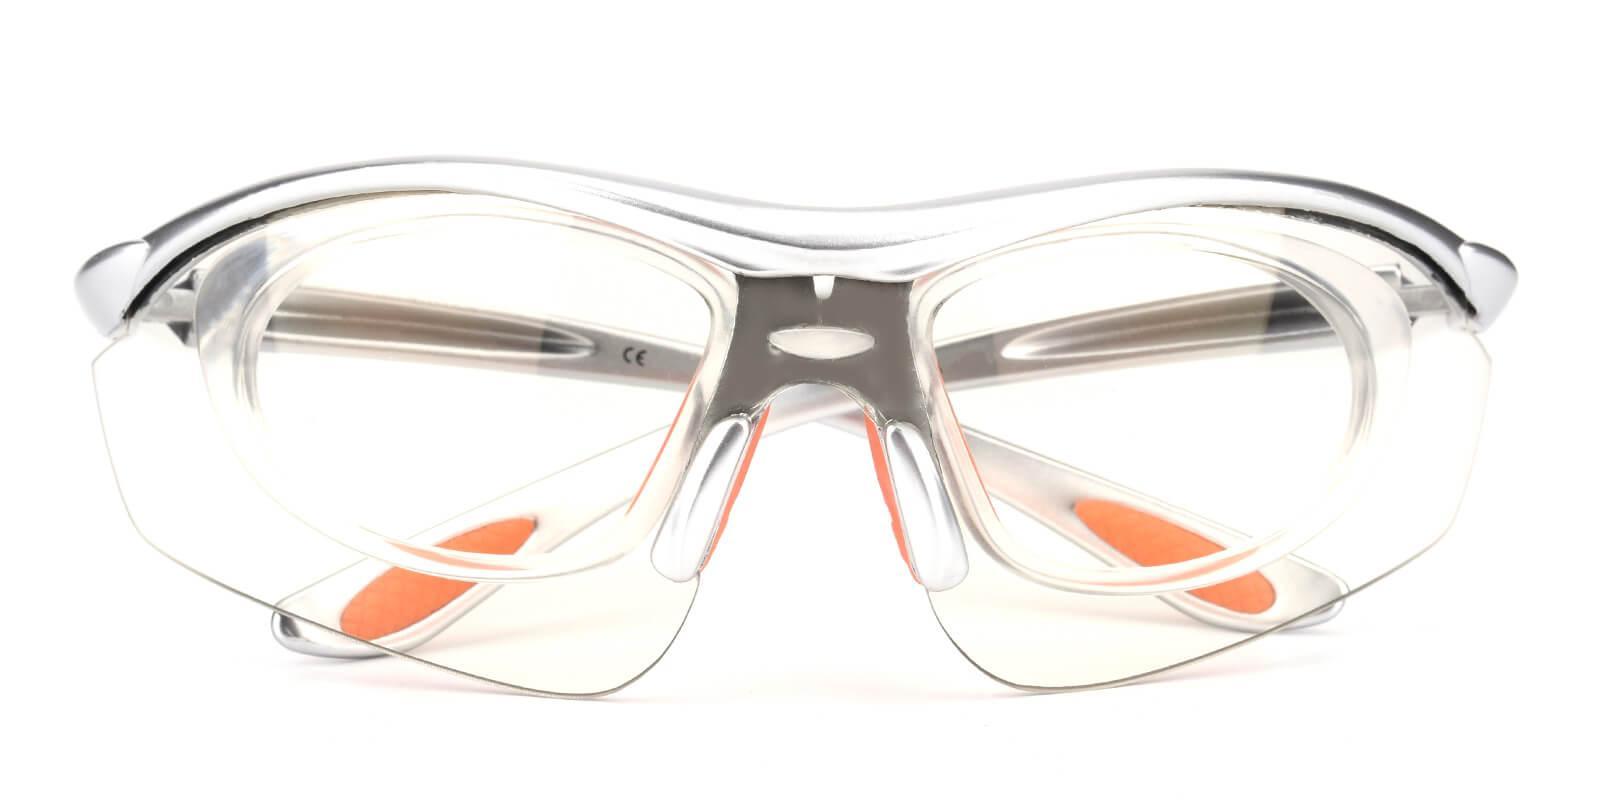 Preavey-Silver-Square-Plastic-SportsGlasses-detail